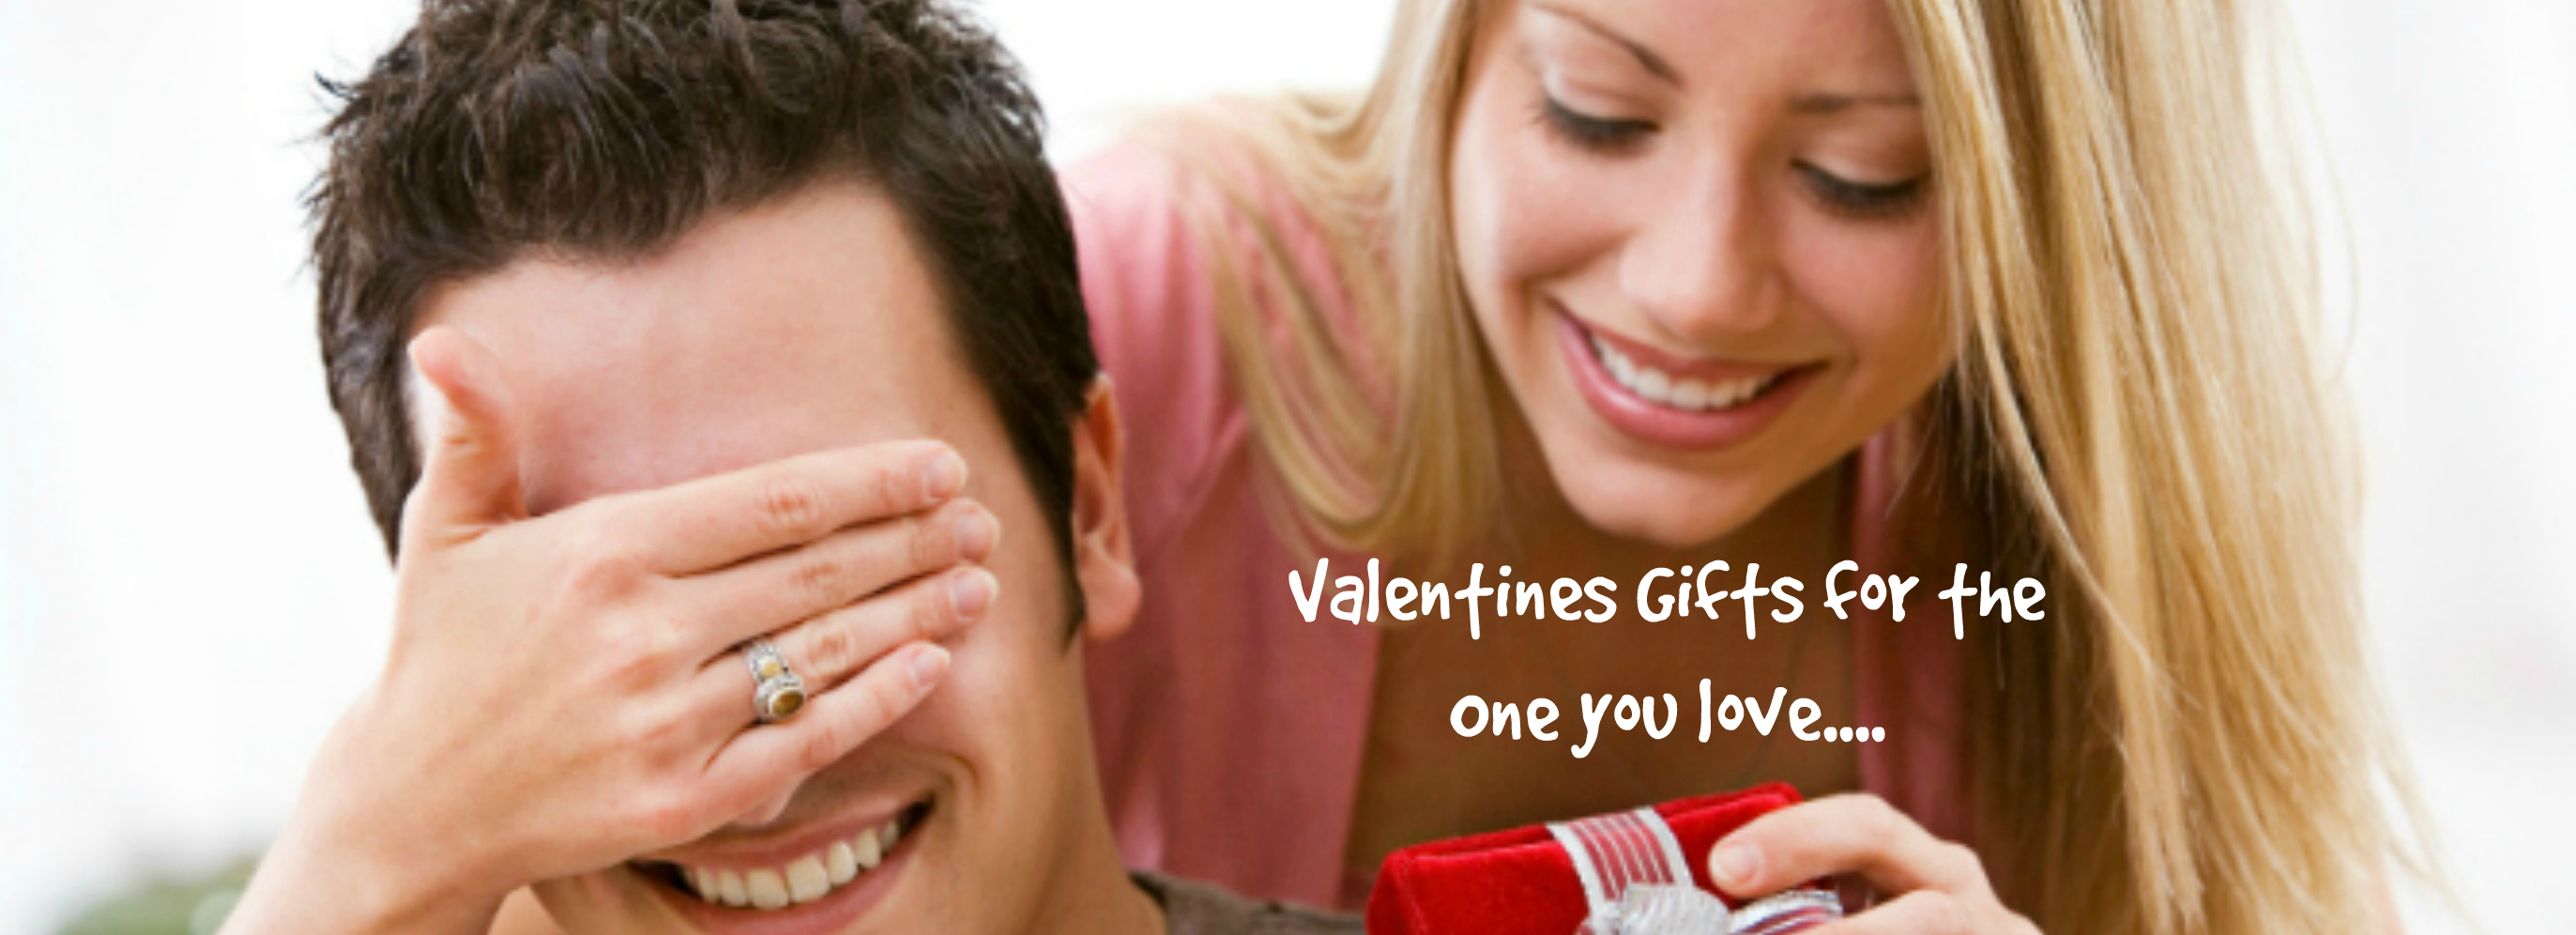 valentines-gifts.jpg